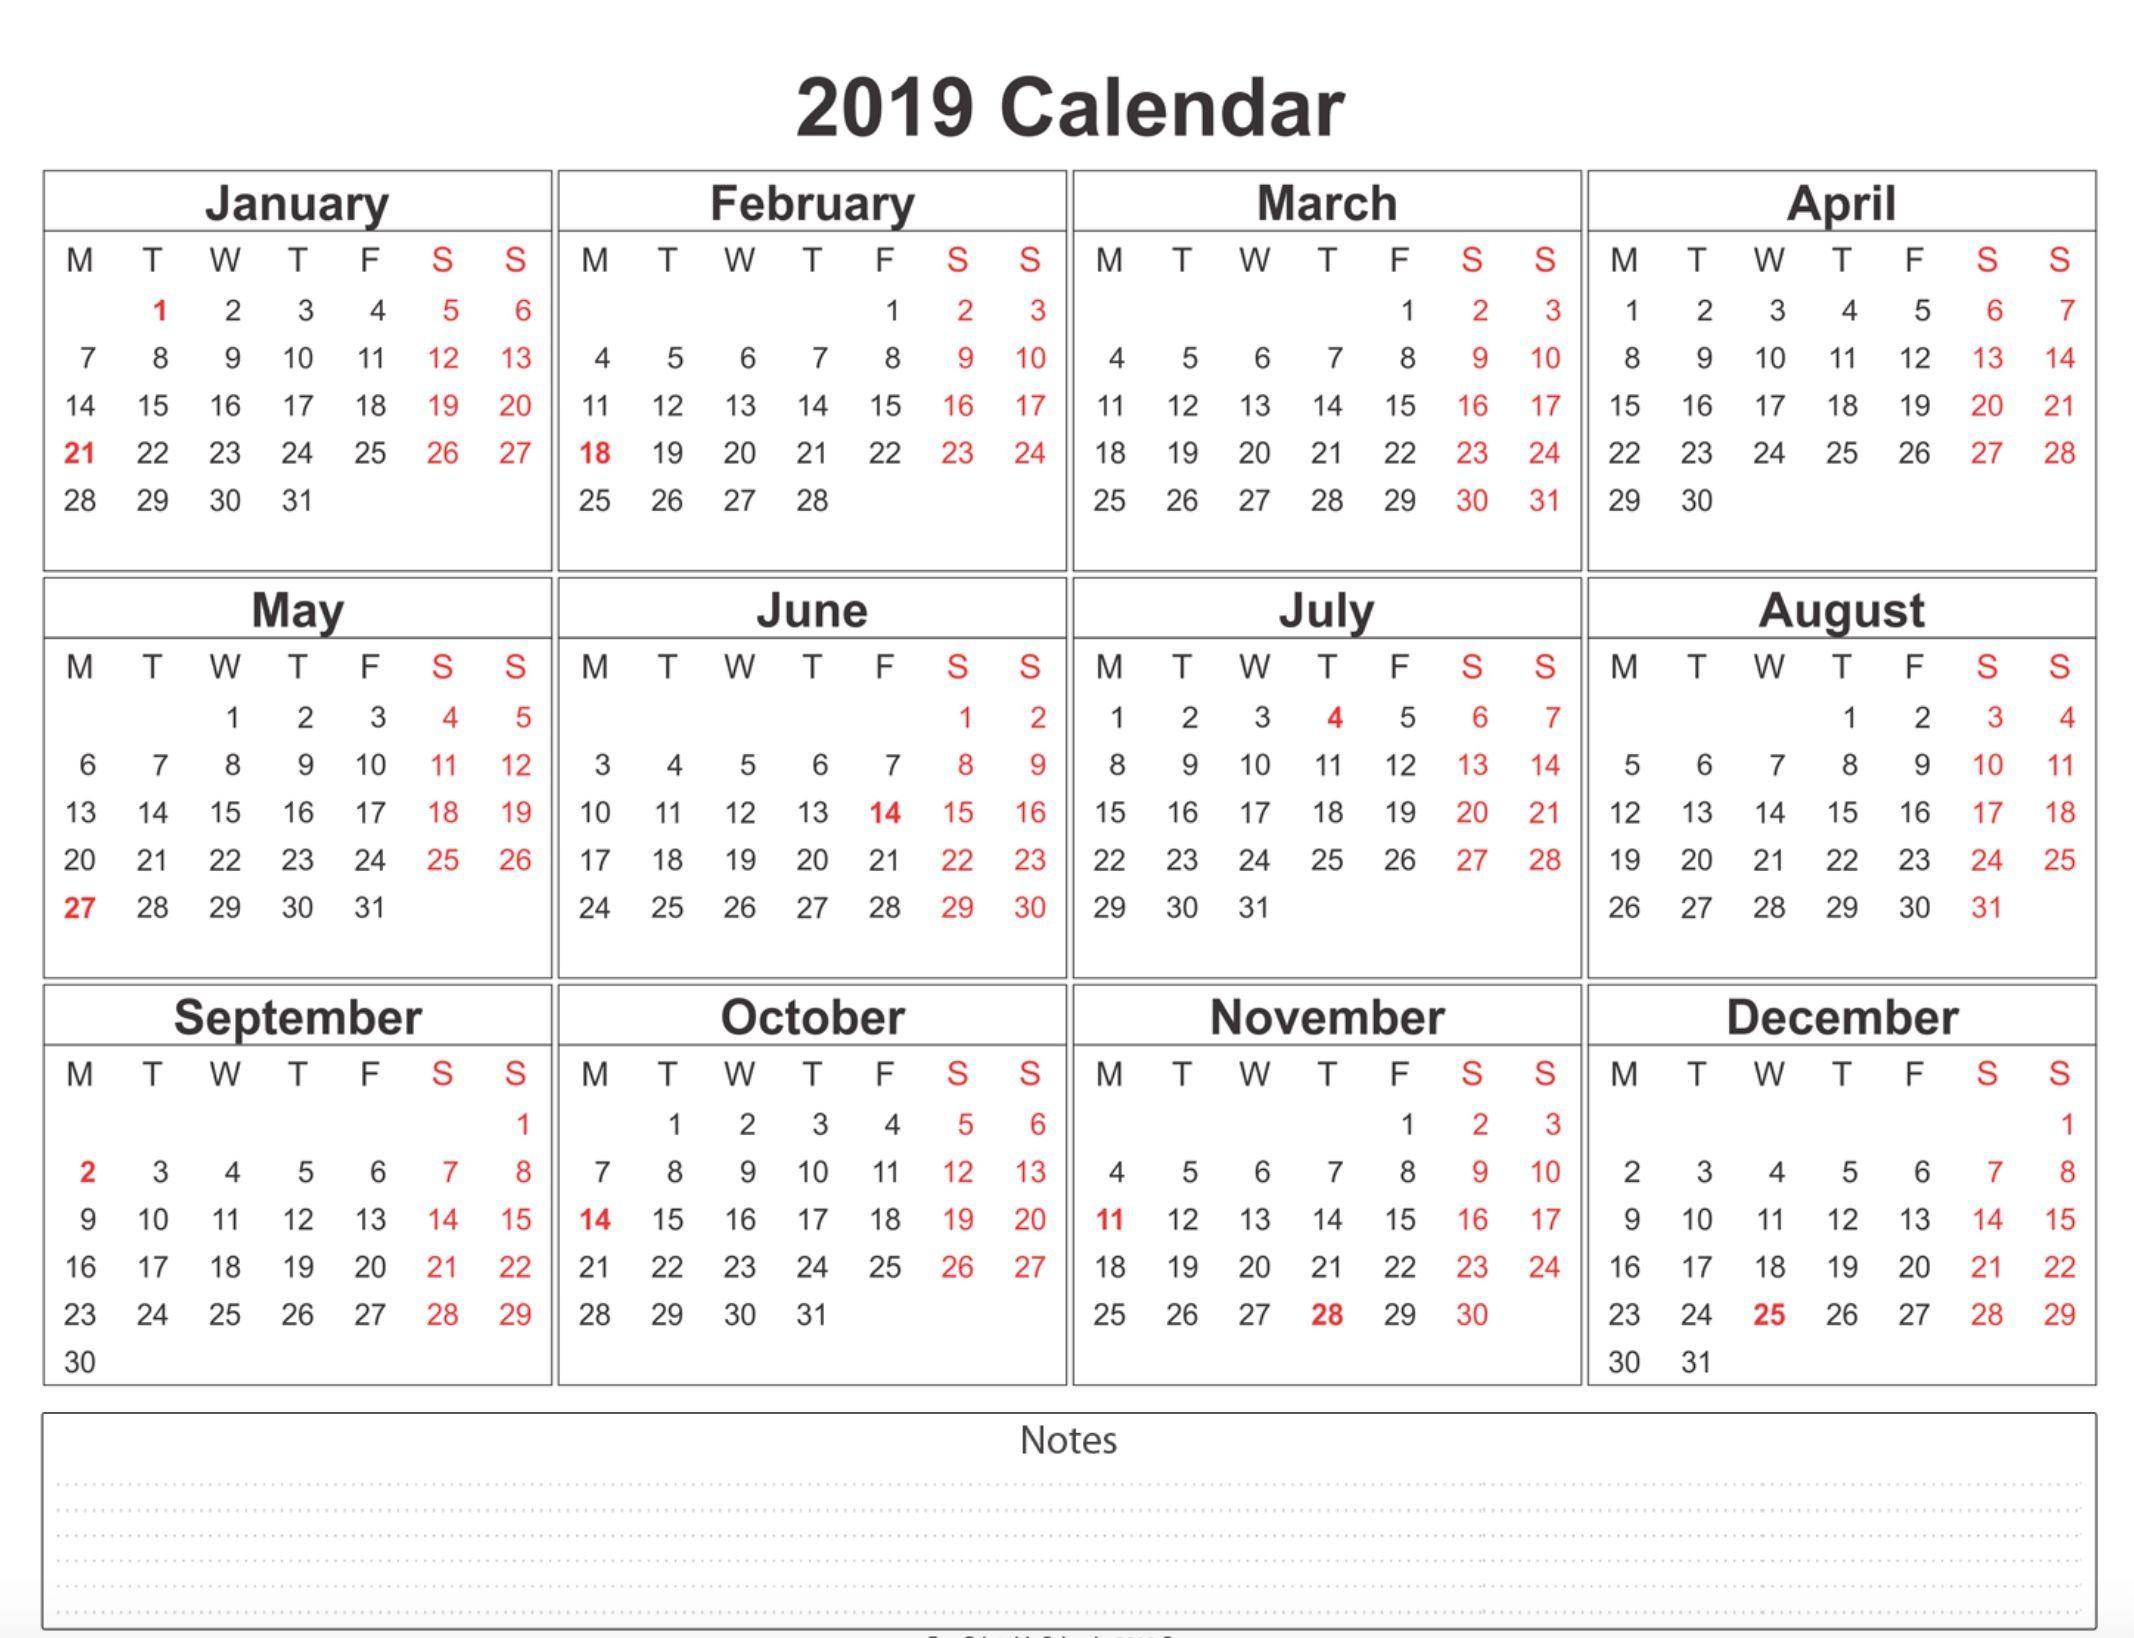 2019 Weekly Calendar Printable | 2019 Calendars | 12 Month Calendar within 12 Month Blank Calendar